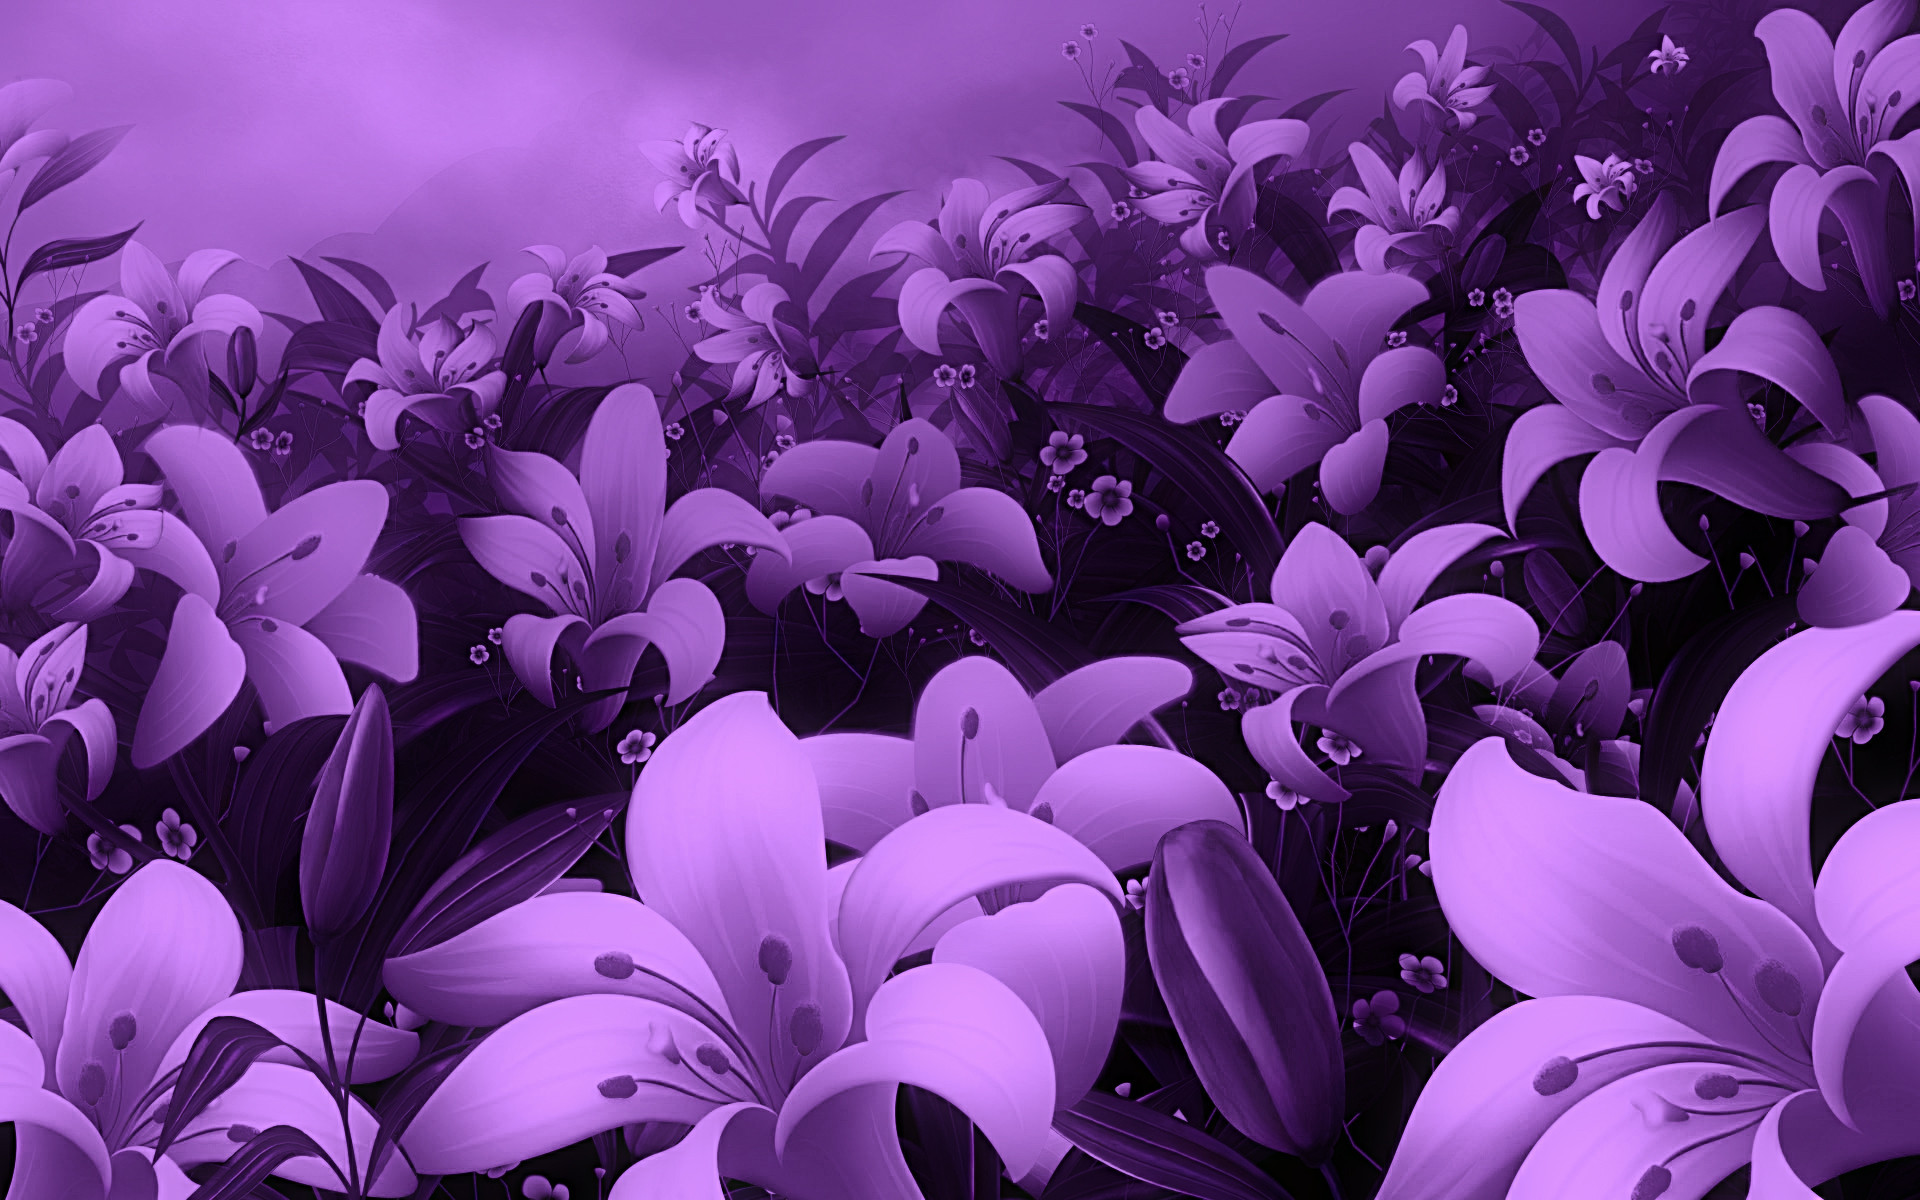 Res: 1920x1200, Violet Rose Wallpapers - Wallpaper Cave